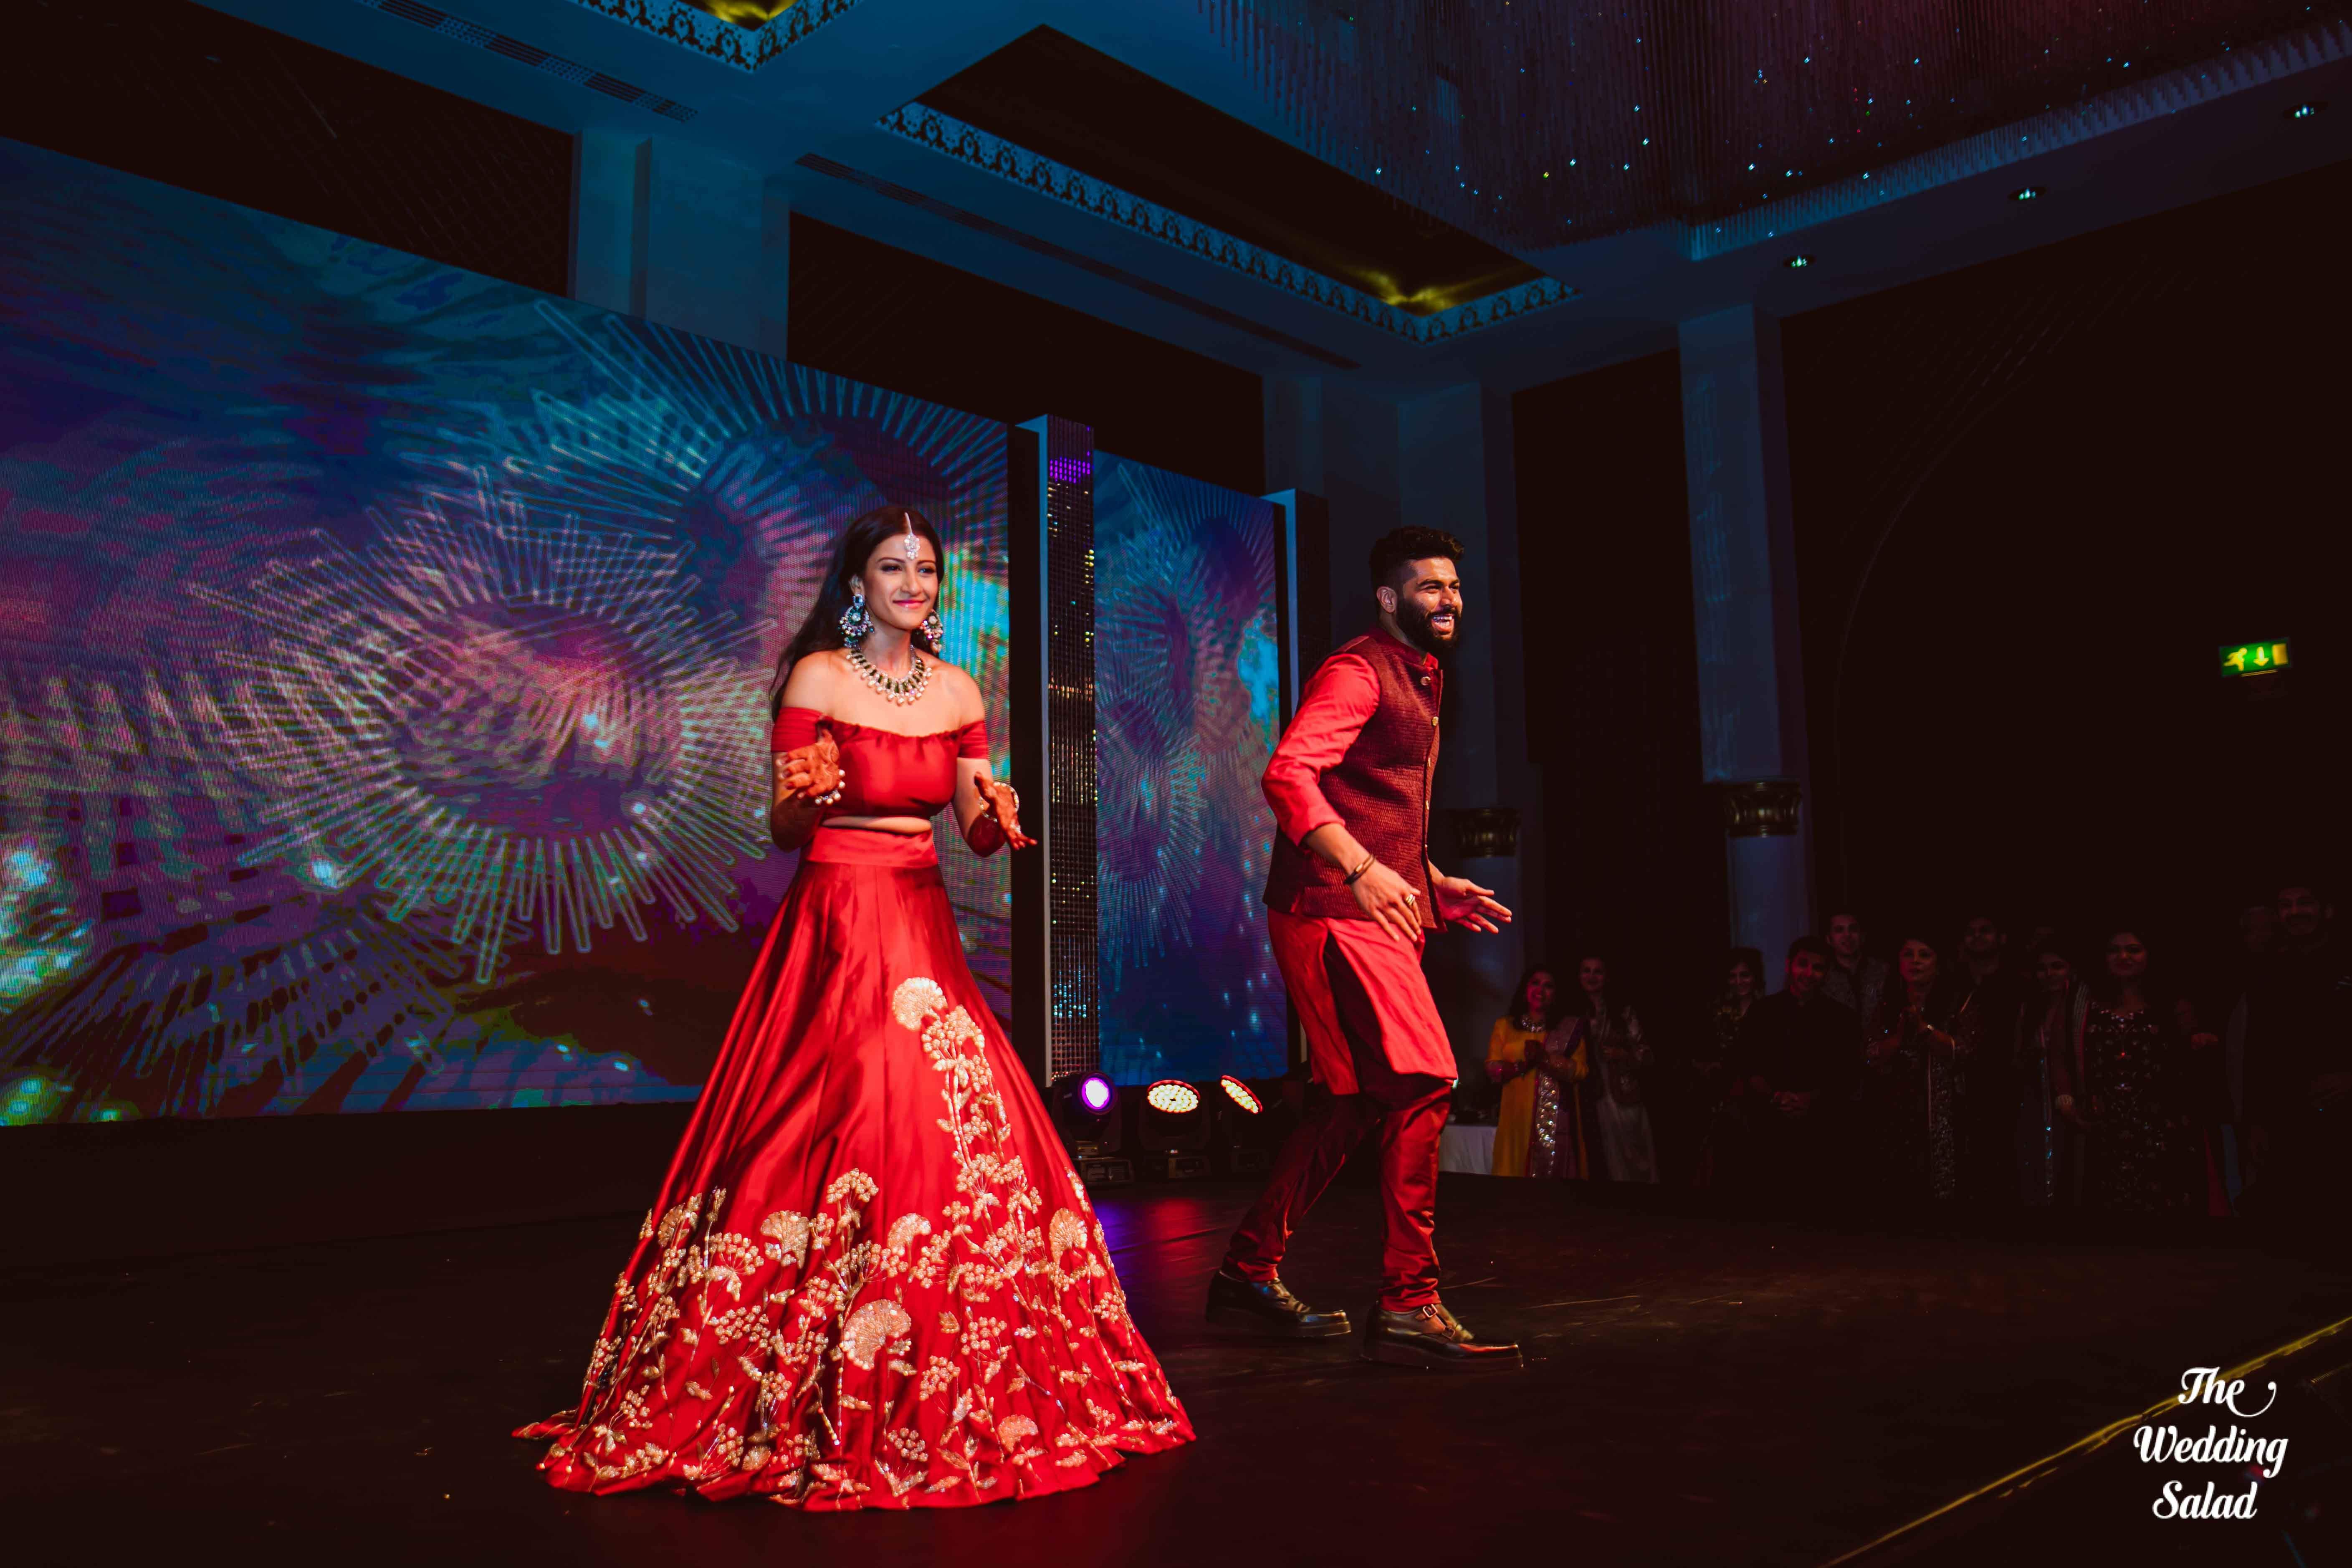 the bride sasha!:the wedding salad, manish malhotra, arpita mehta, sabyasachi couture pvt ltd